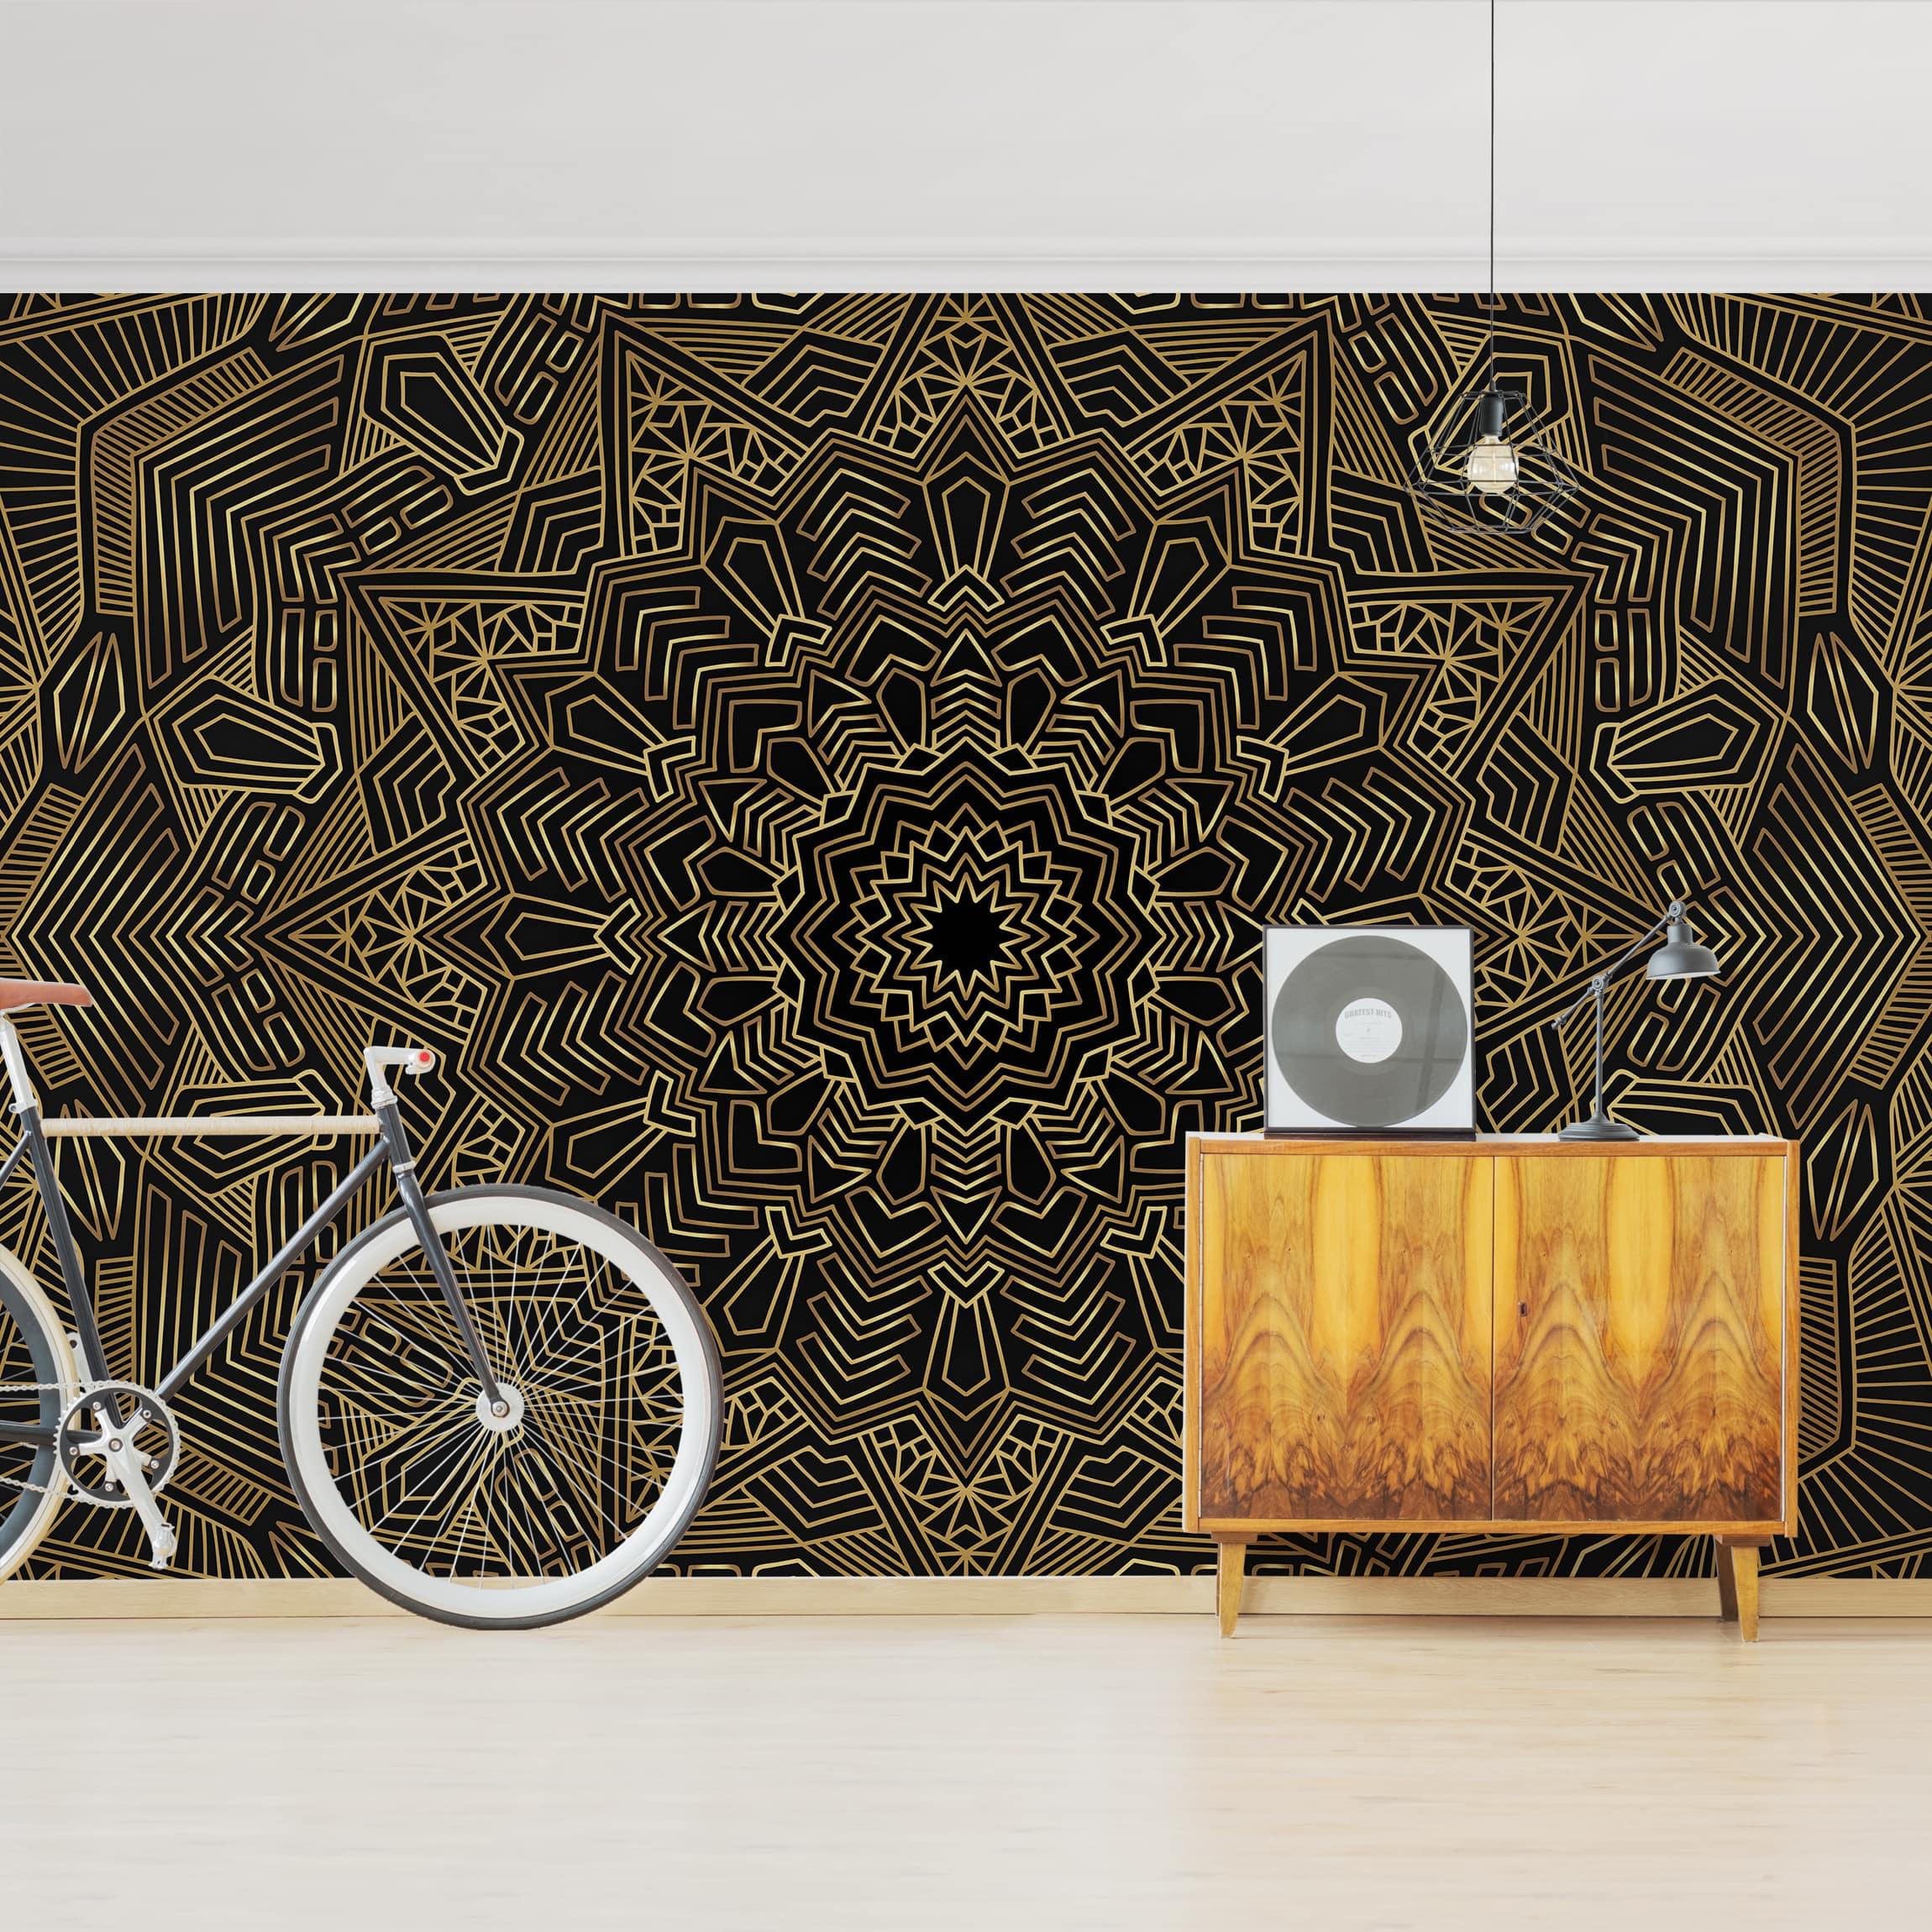 Tapete selbstklebend - Mandala Stern Muster gold schwarz ...